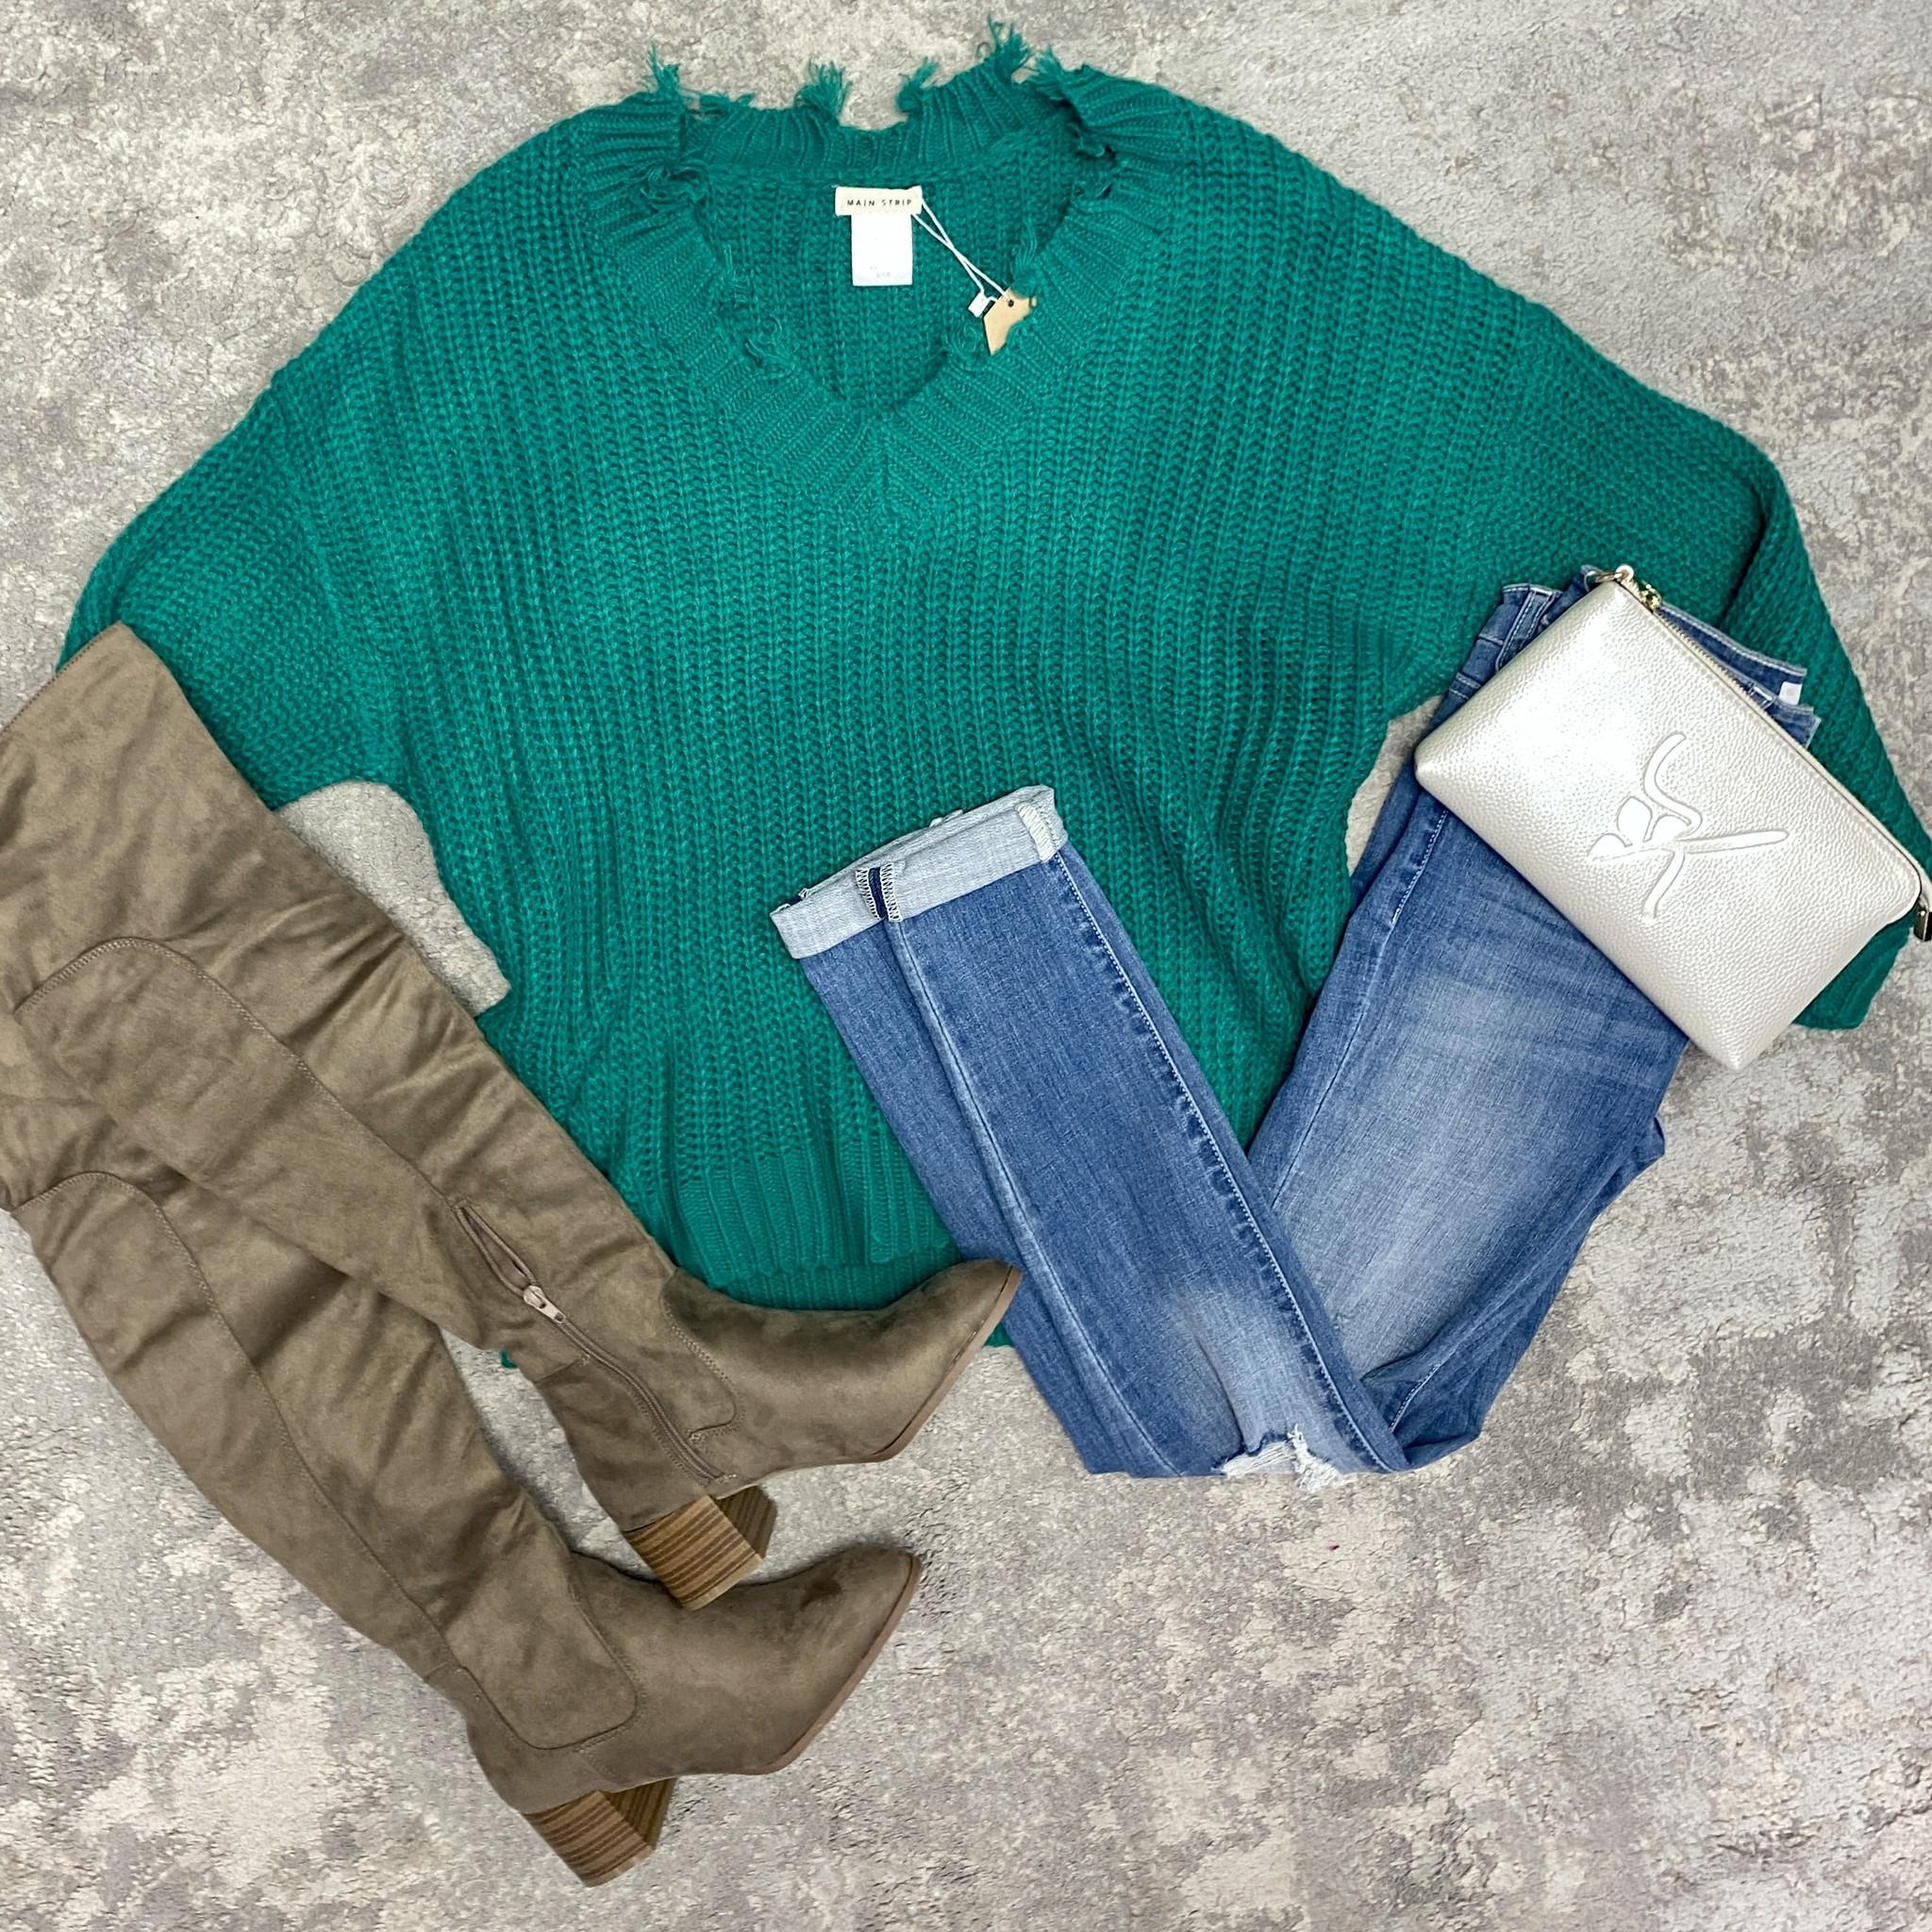 Green Grinch sweater